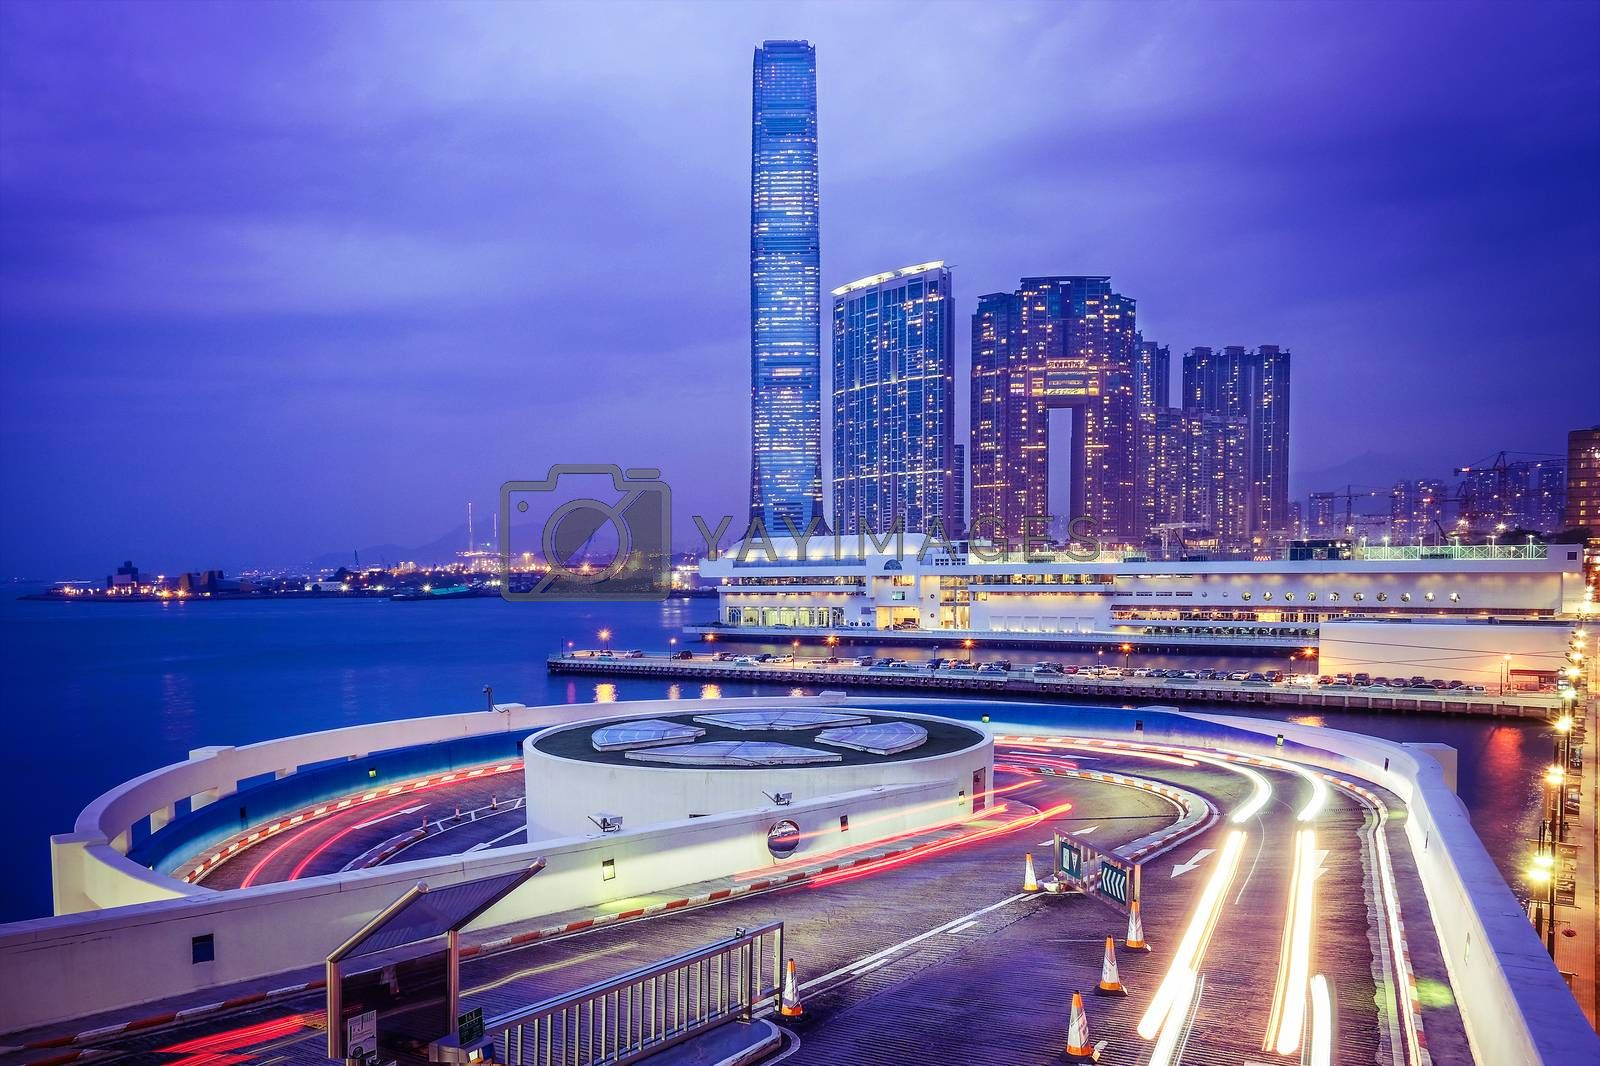 Night view traffic in Hong Kong at sunset time